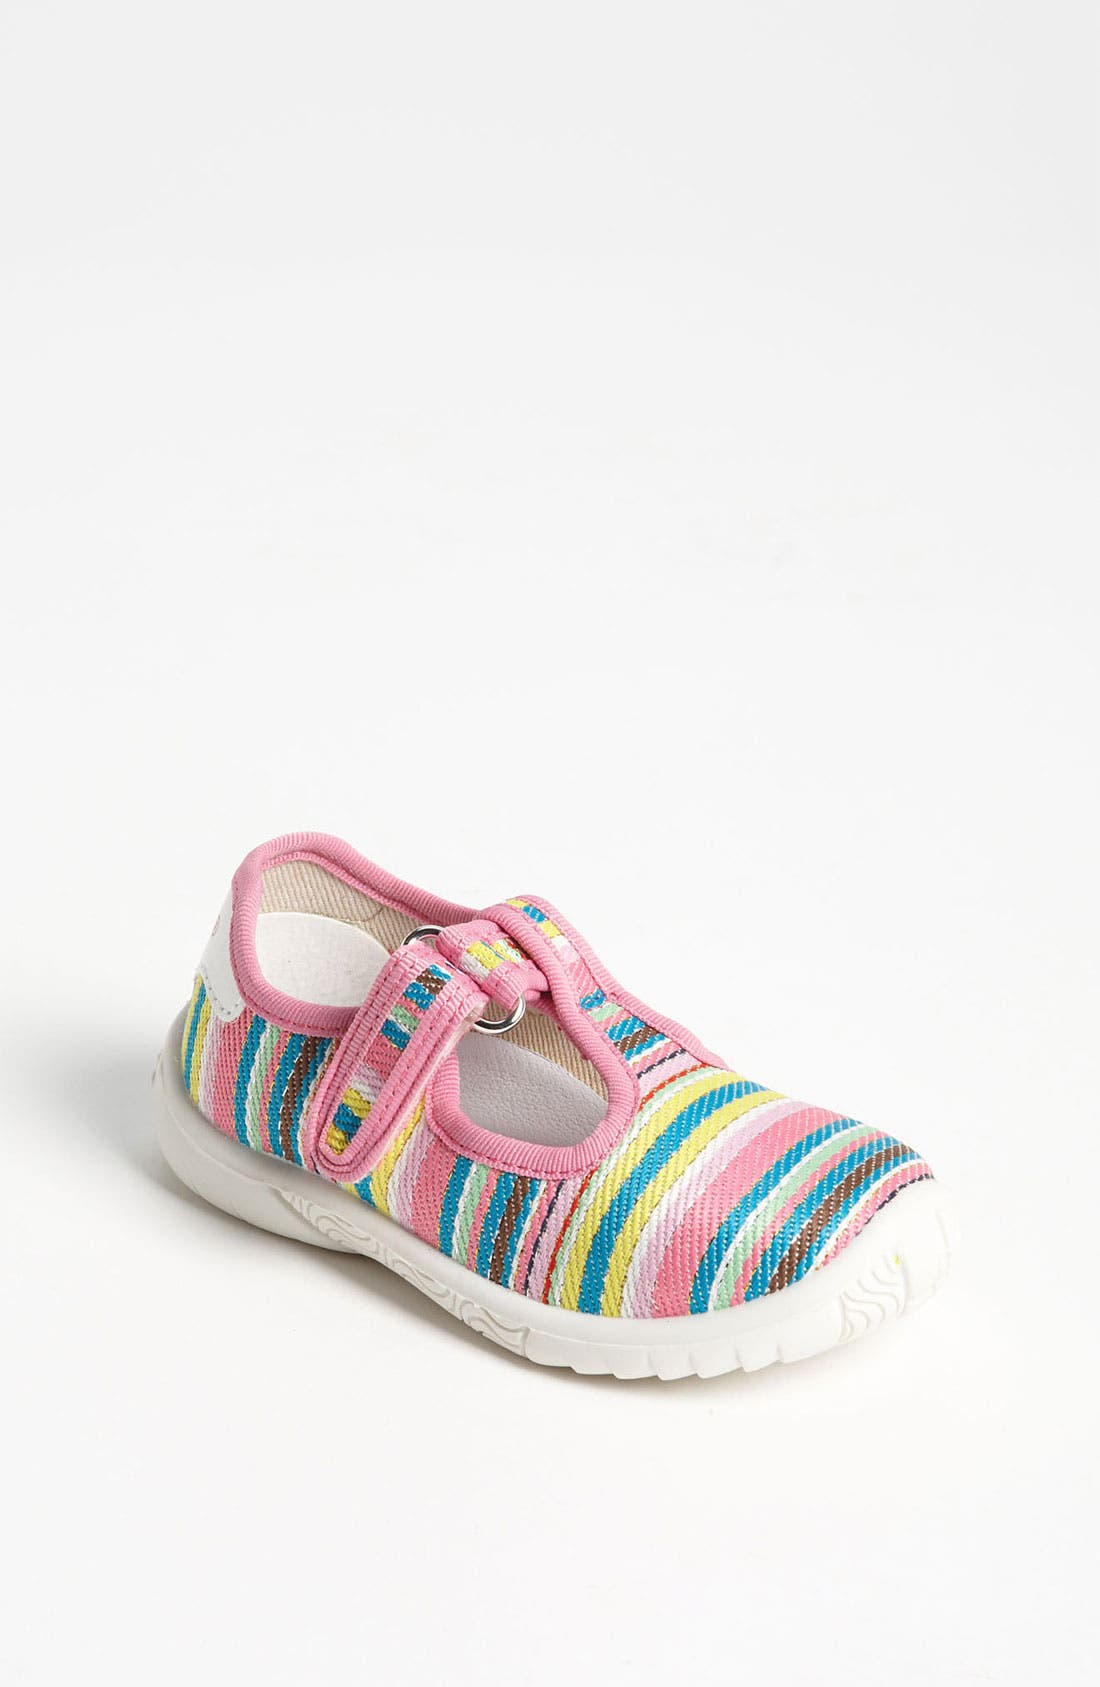 Alternate Image 1 Selected - Naturino '7477' Mary Jane Sneaker (Baby & Walker)